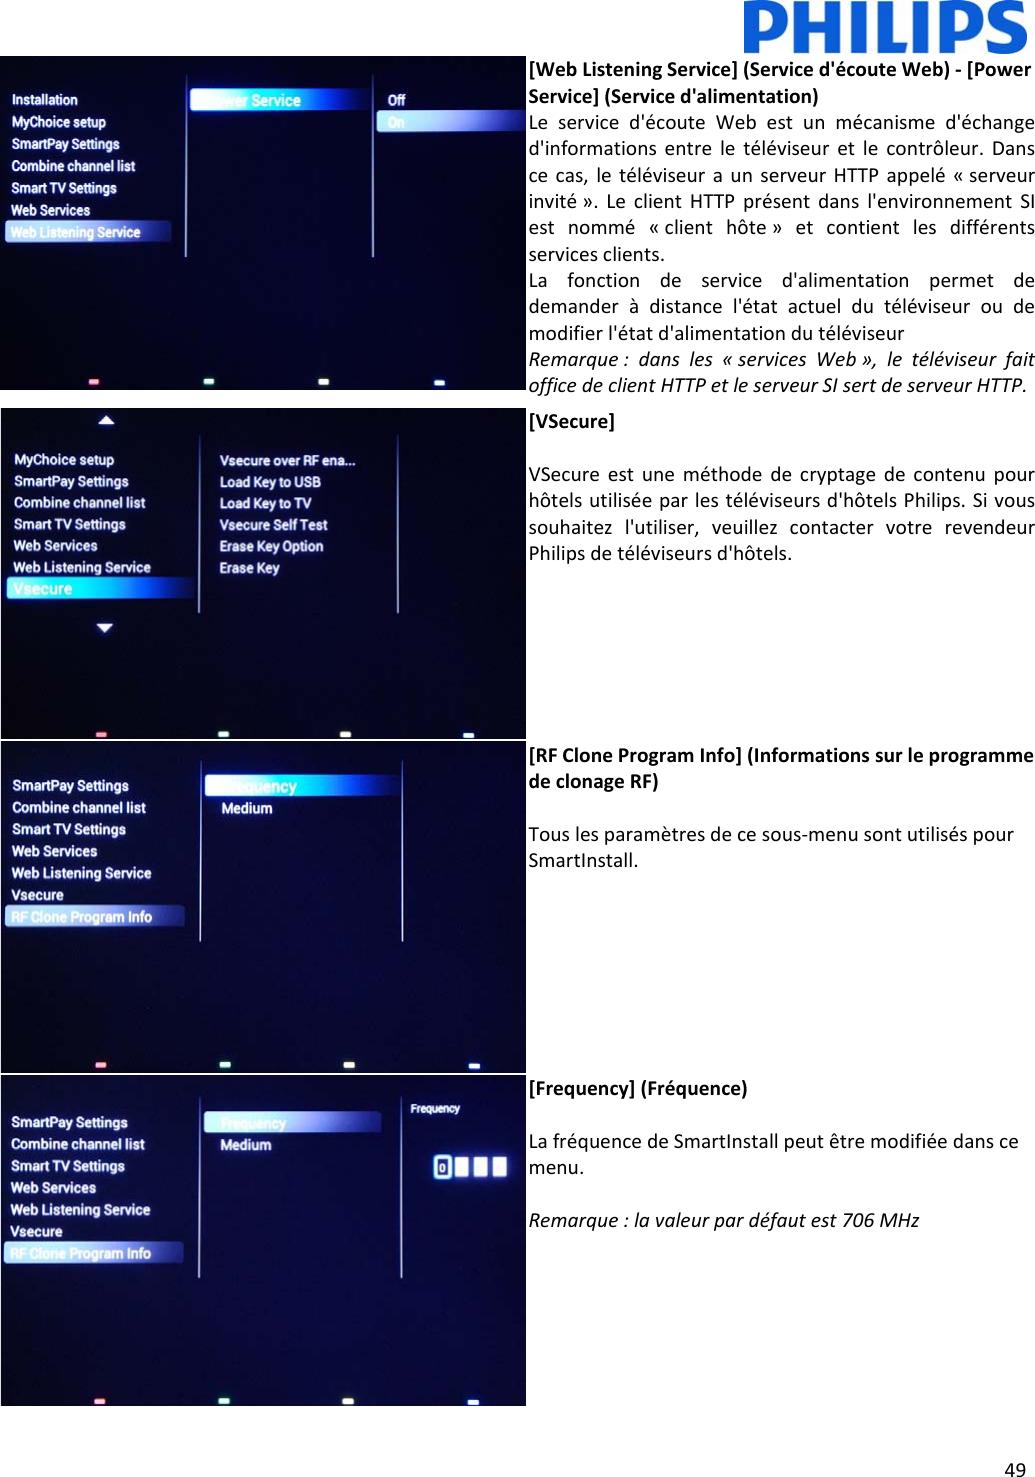 Philips Installation Manual 28 32 40 48 50HFL5x10_42